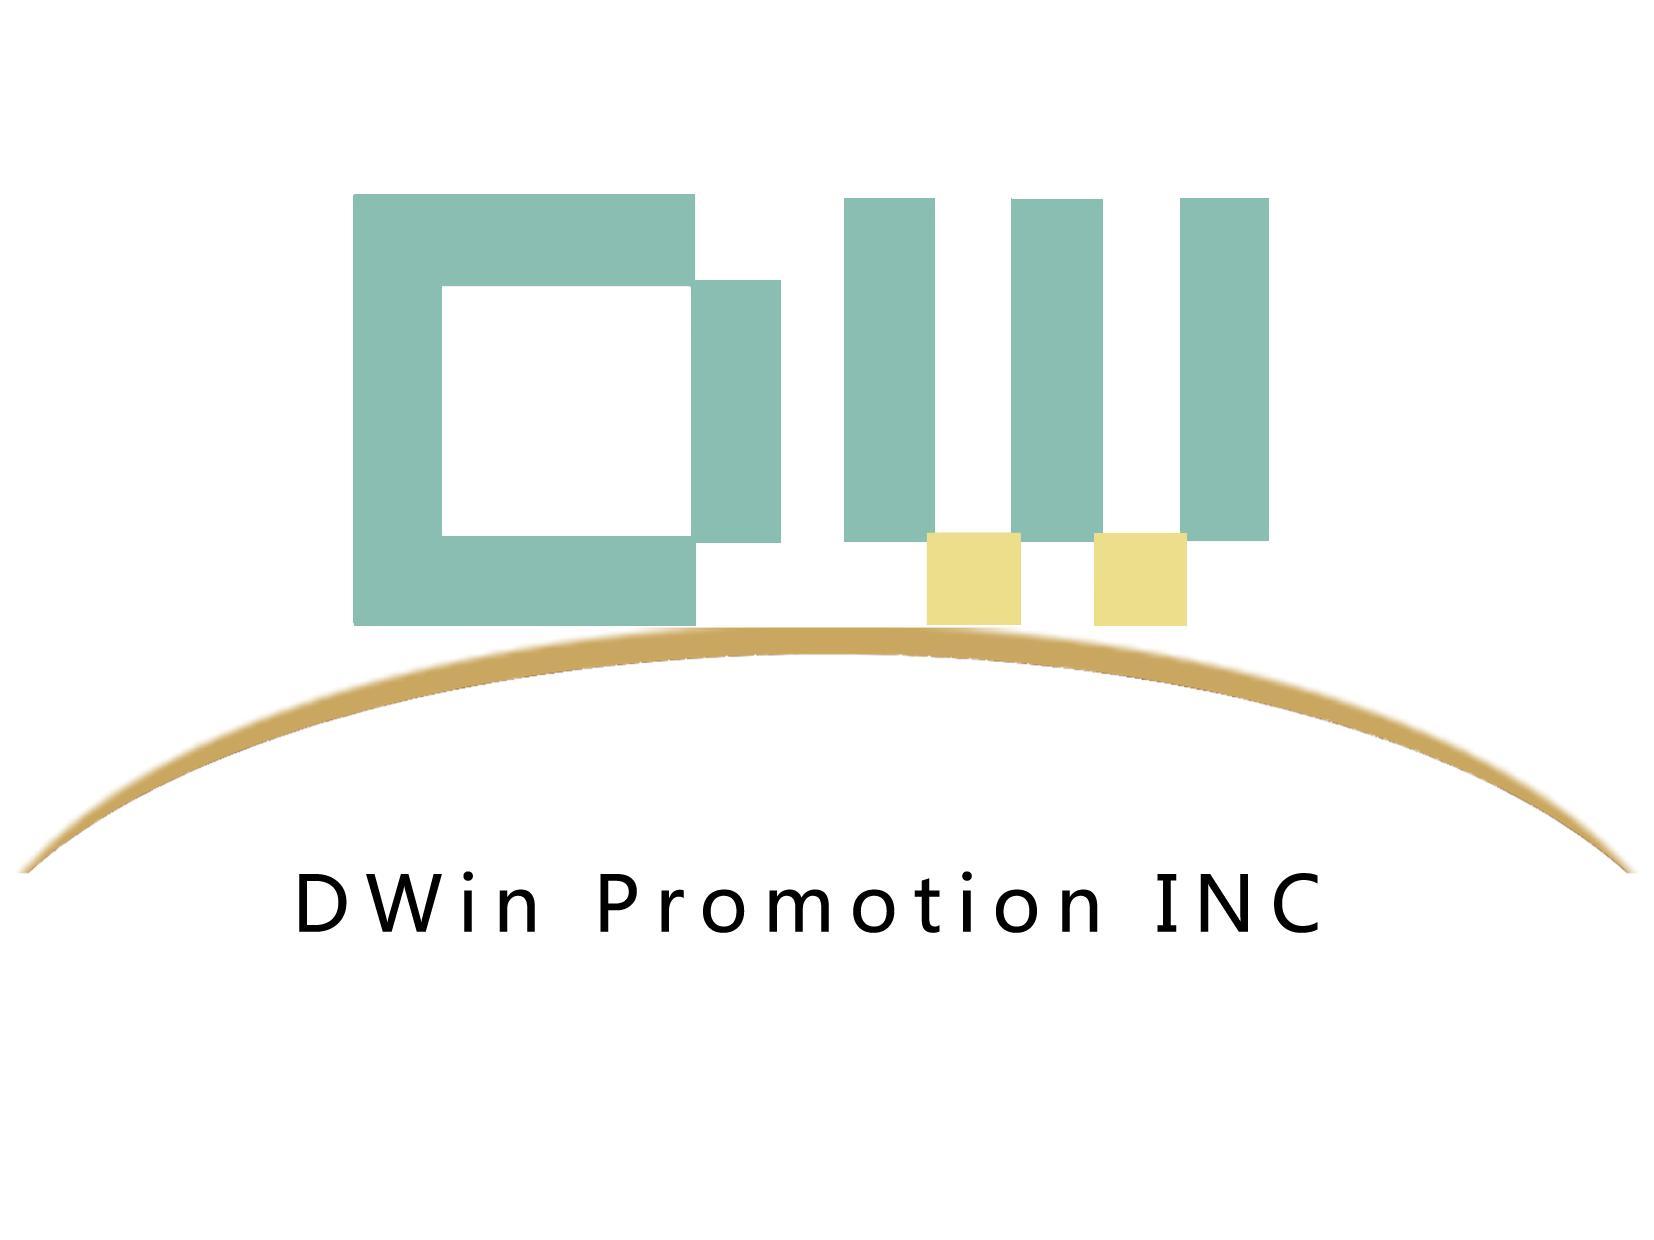 DWin Promotions Inc.